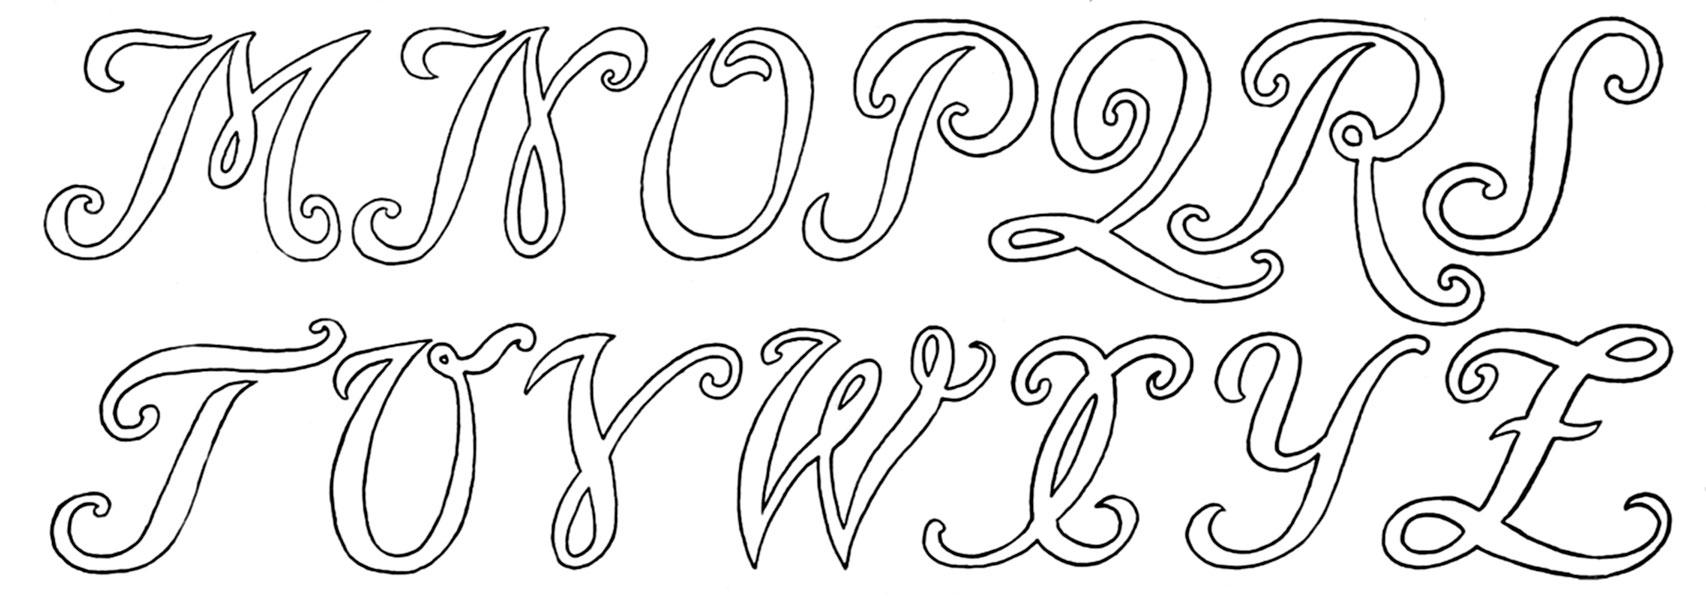 Oregon-Daily-Journal-Alphabet-1917-2